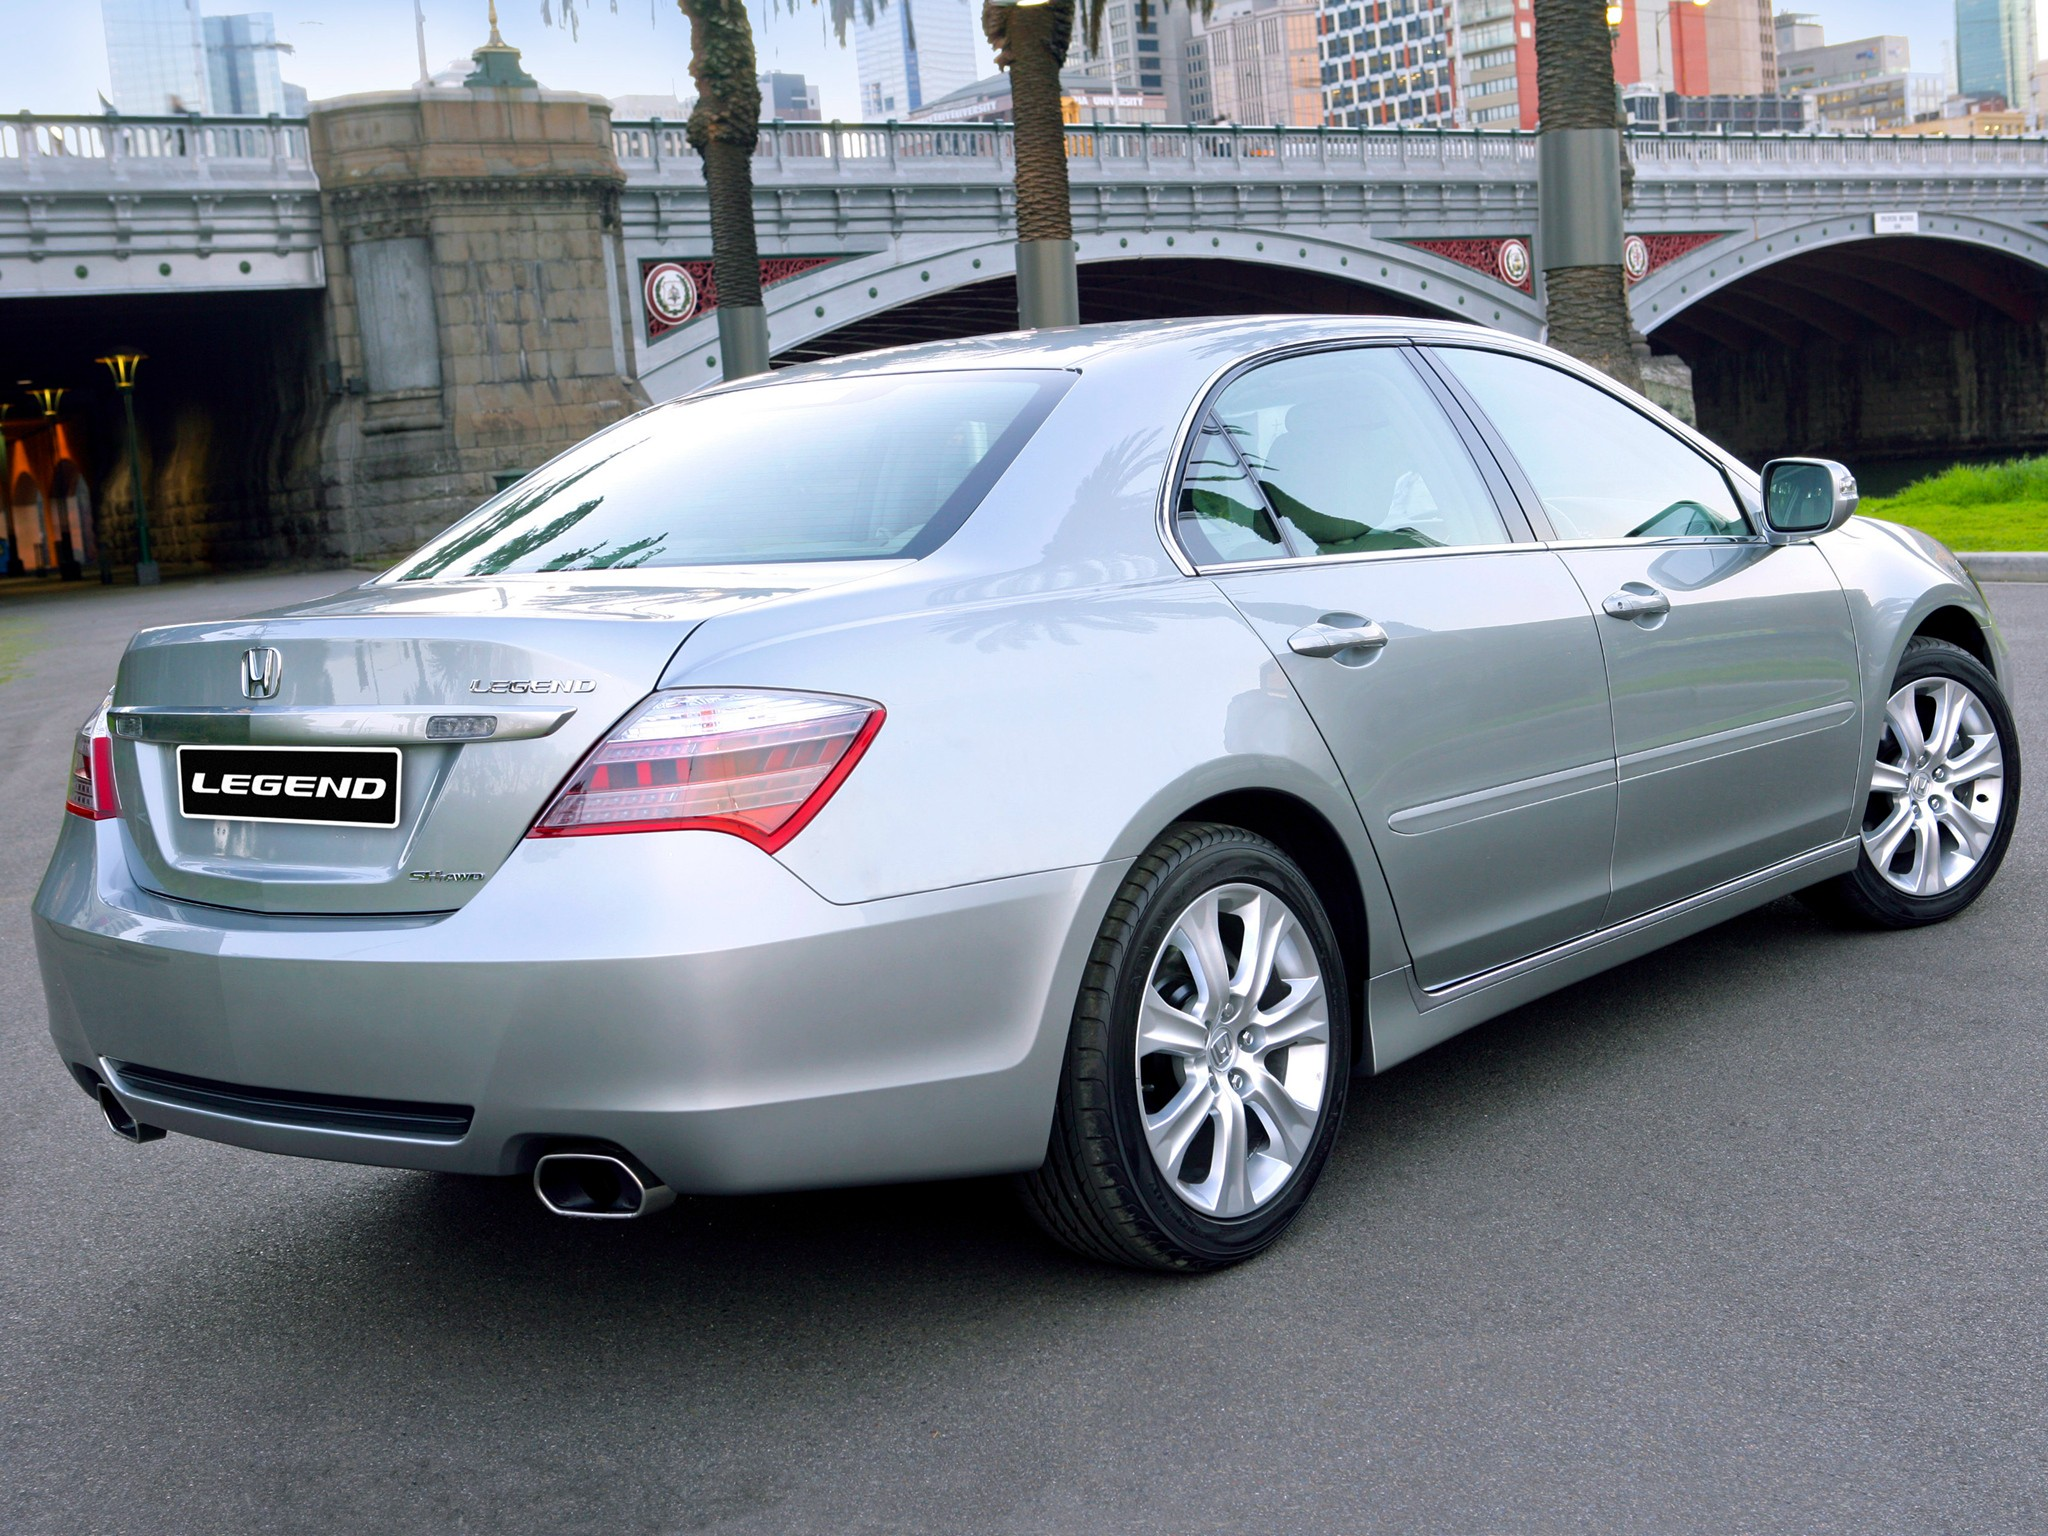 HONDA Legend - 2009, 2010, 2011, 2012 - autoevolution